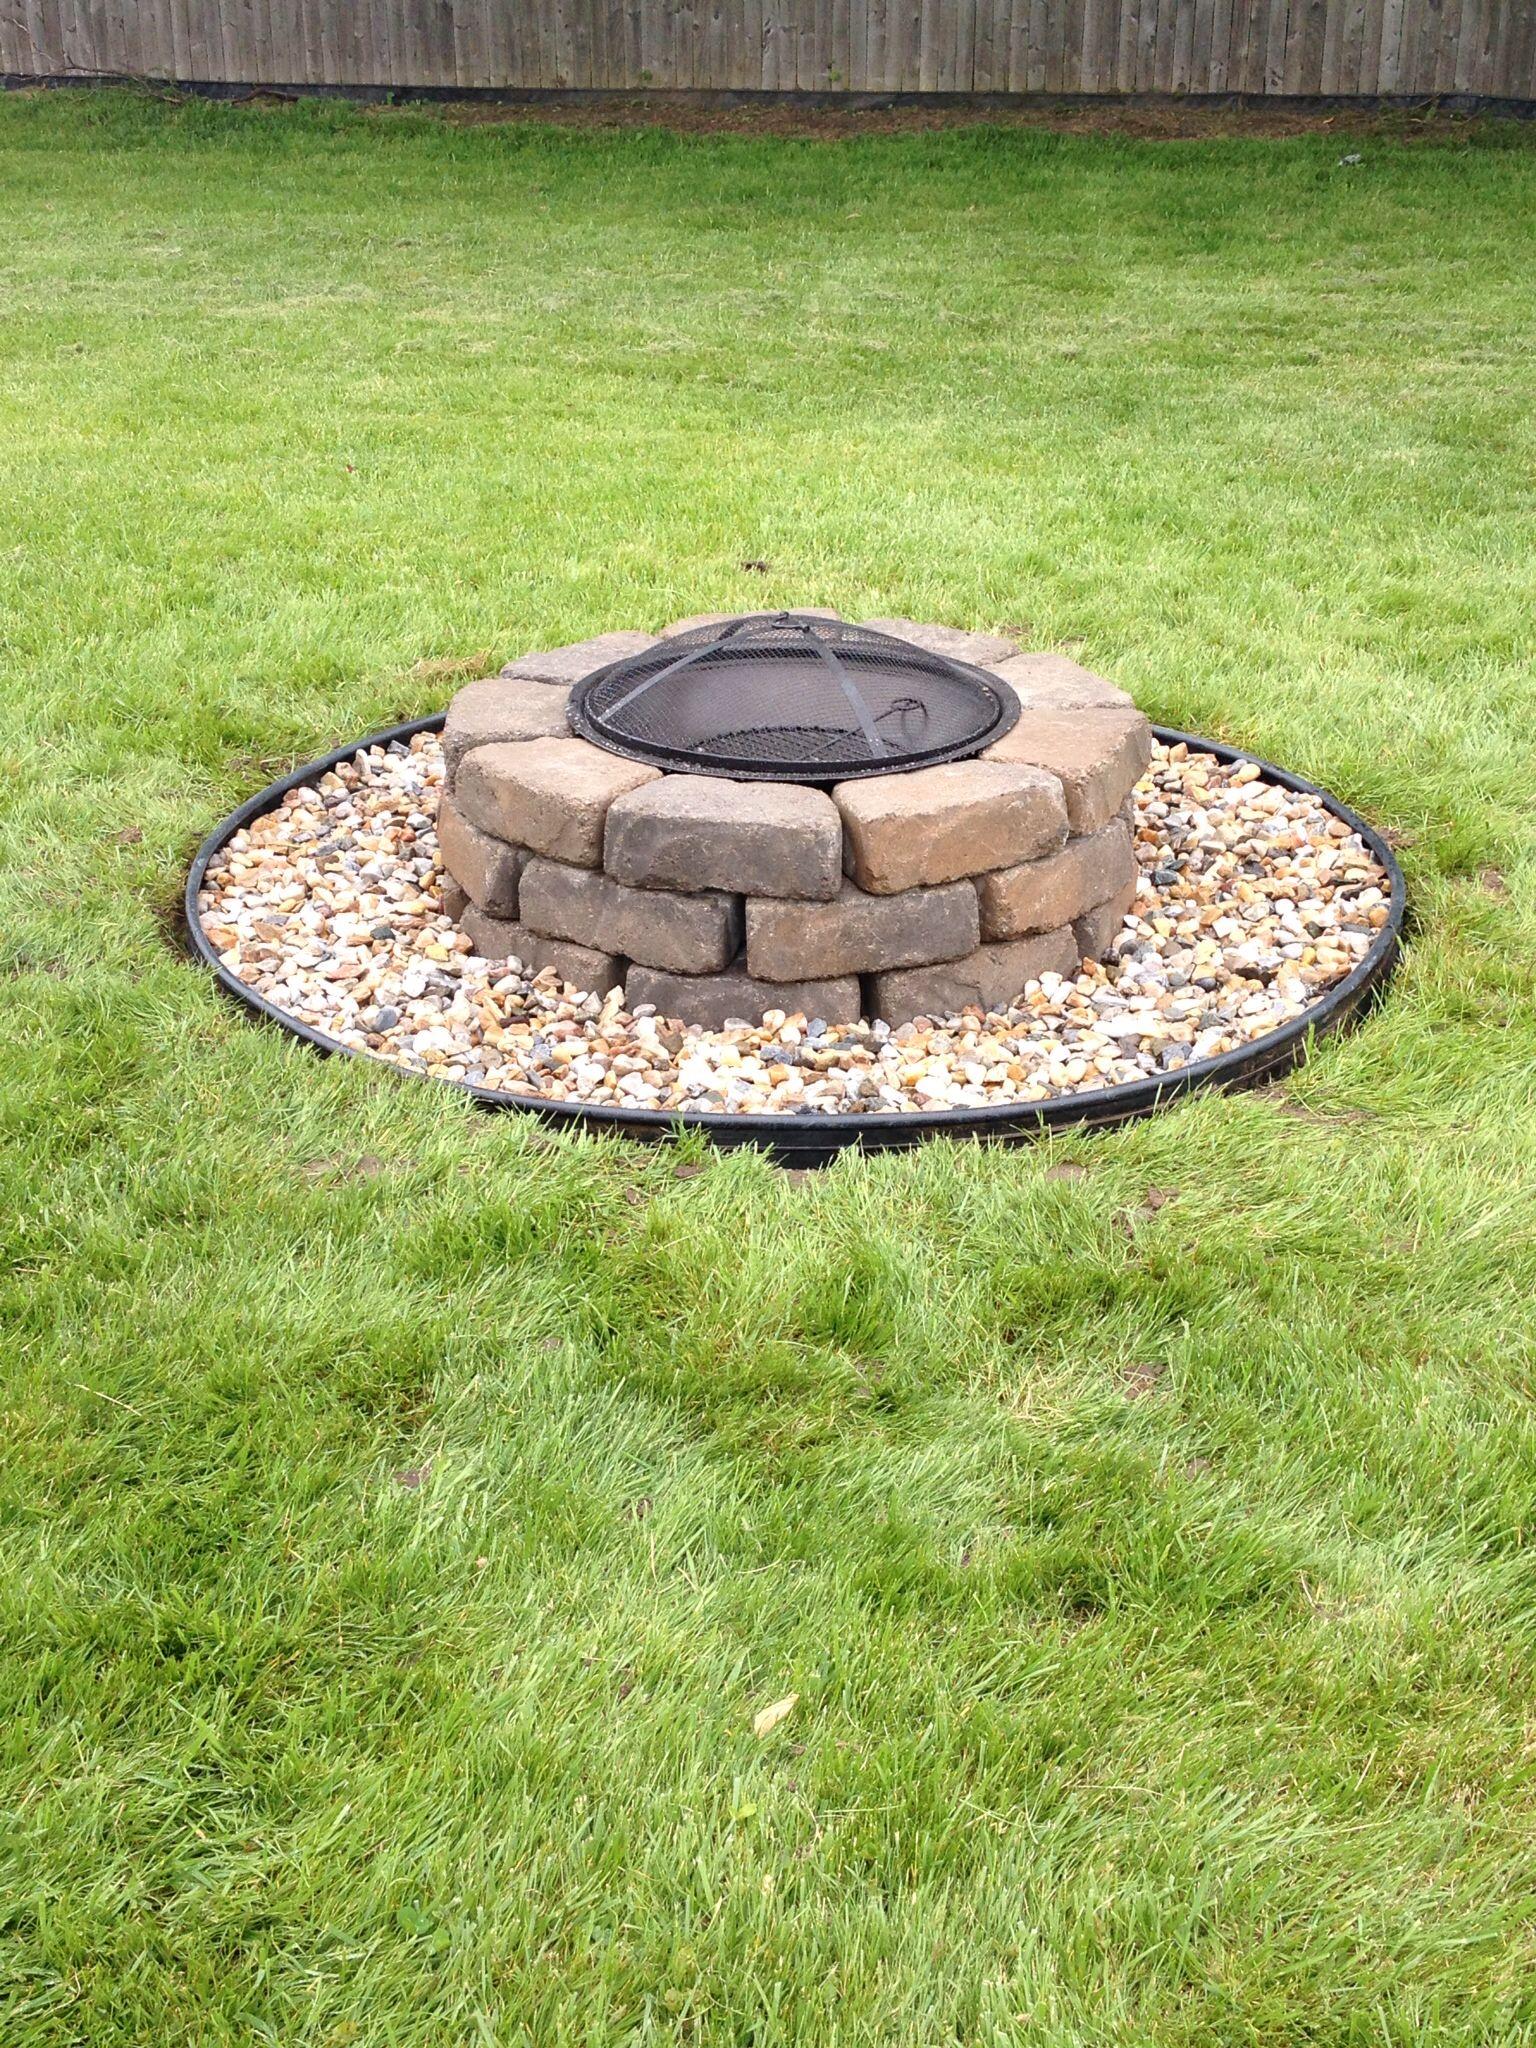 Fire Pit Designs Lowes Part - 21: Fire Pit DIY Project -- Less Than $100 (excludes Fire Pit Bowl And Landscape